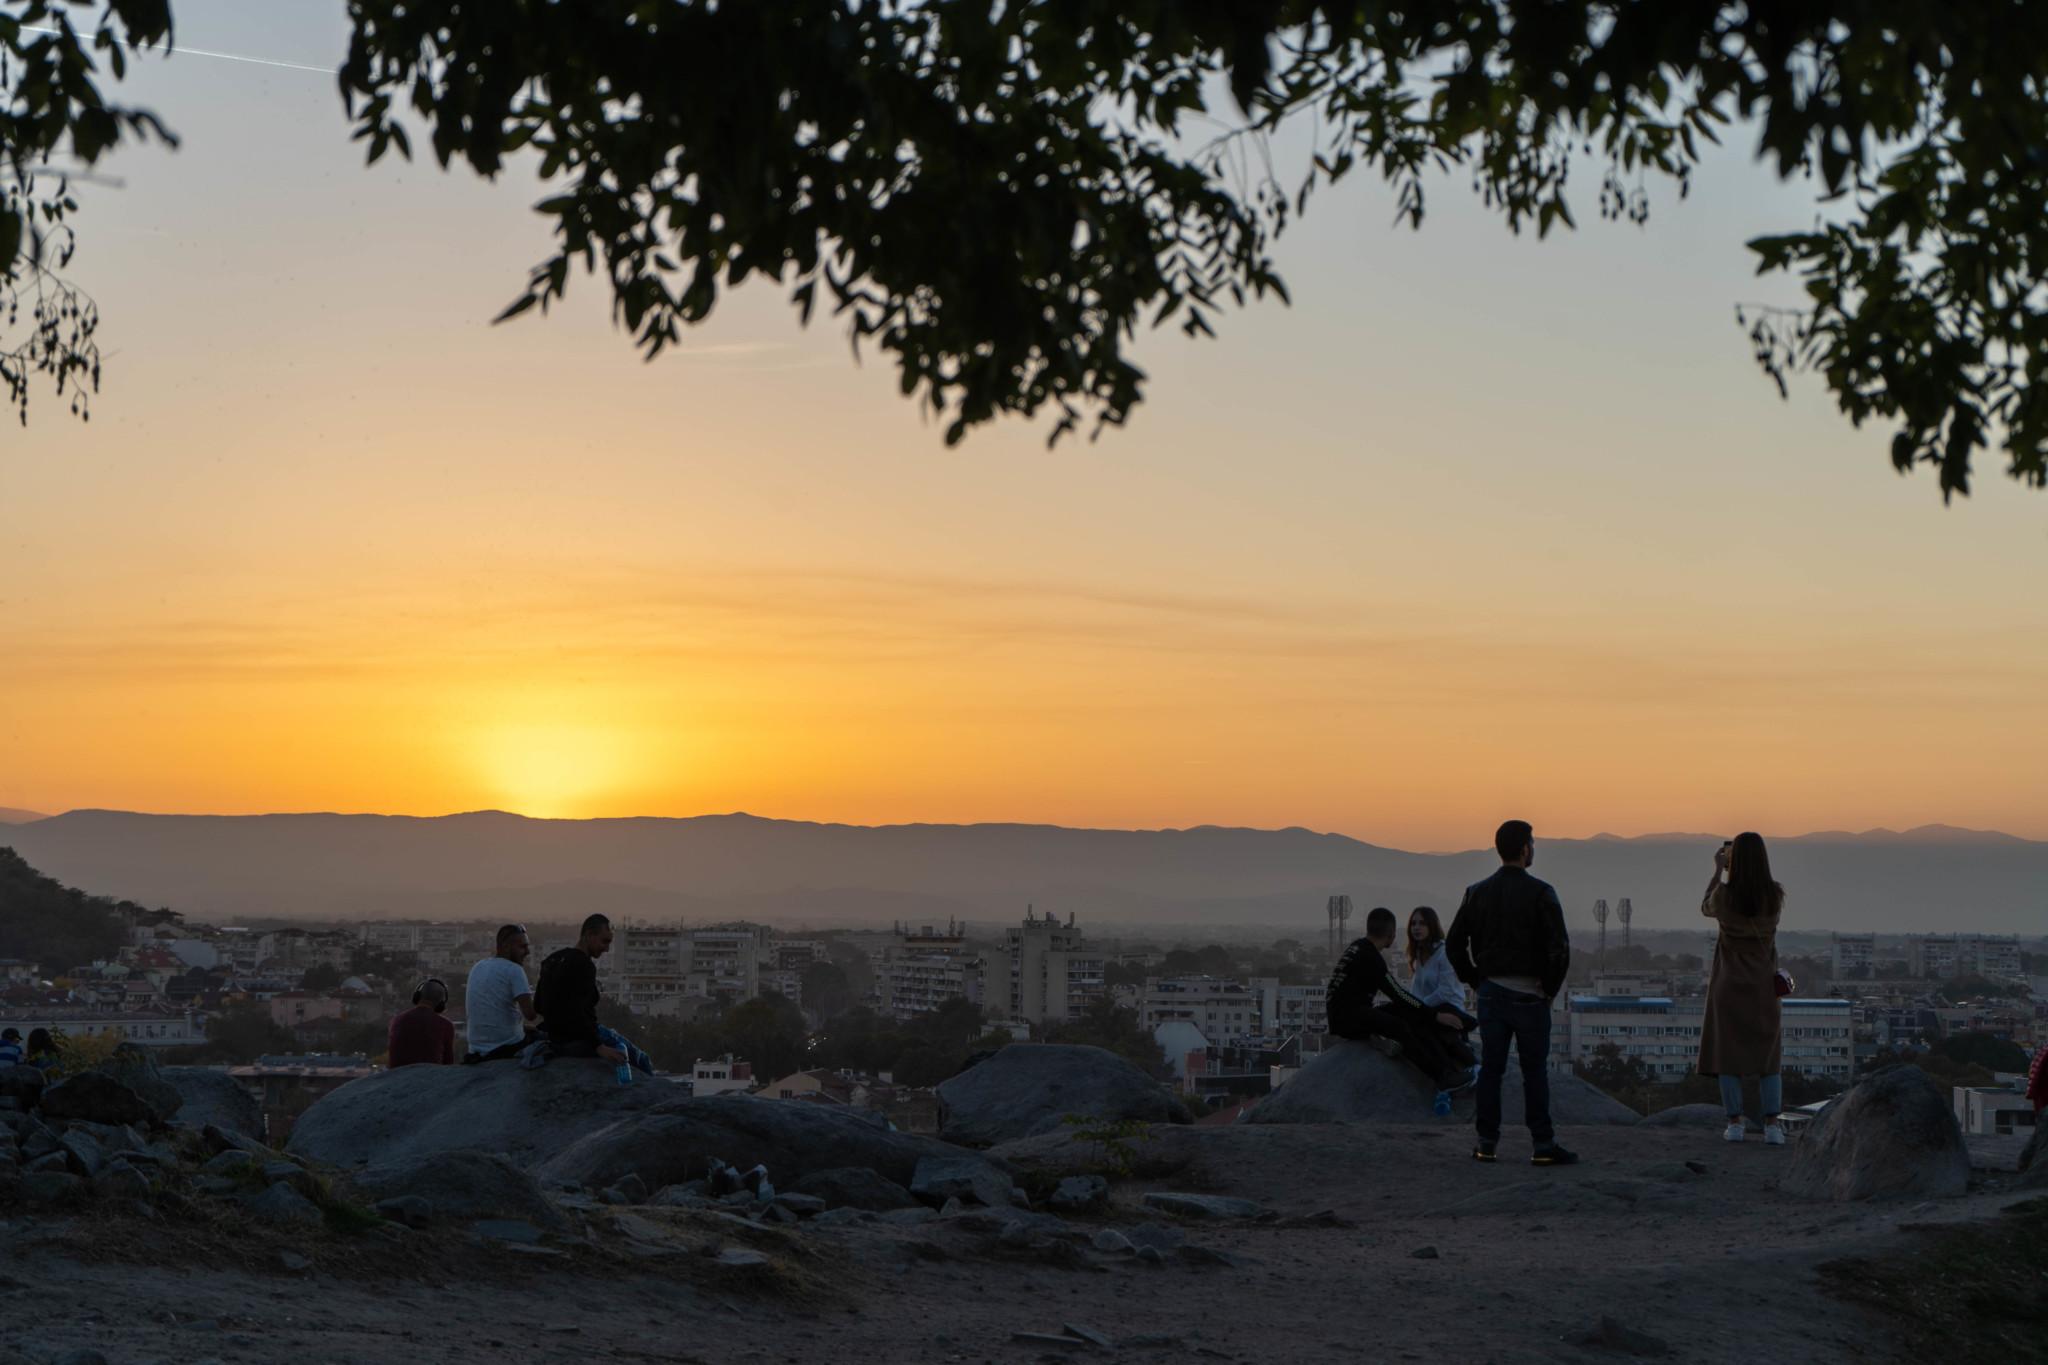 Sonnenuntergang auf dem Nebet Tepe